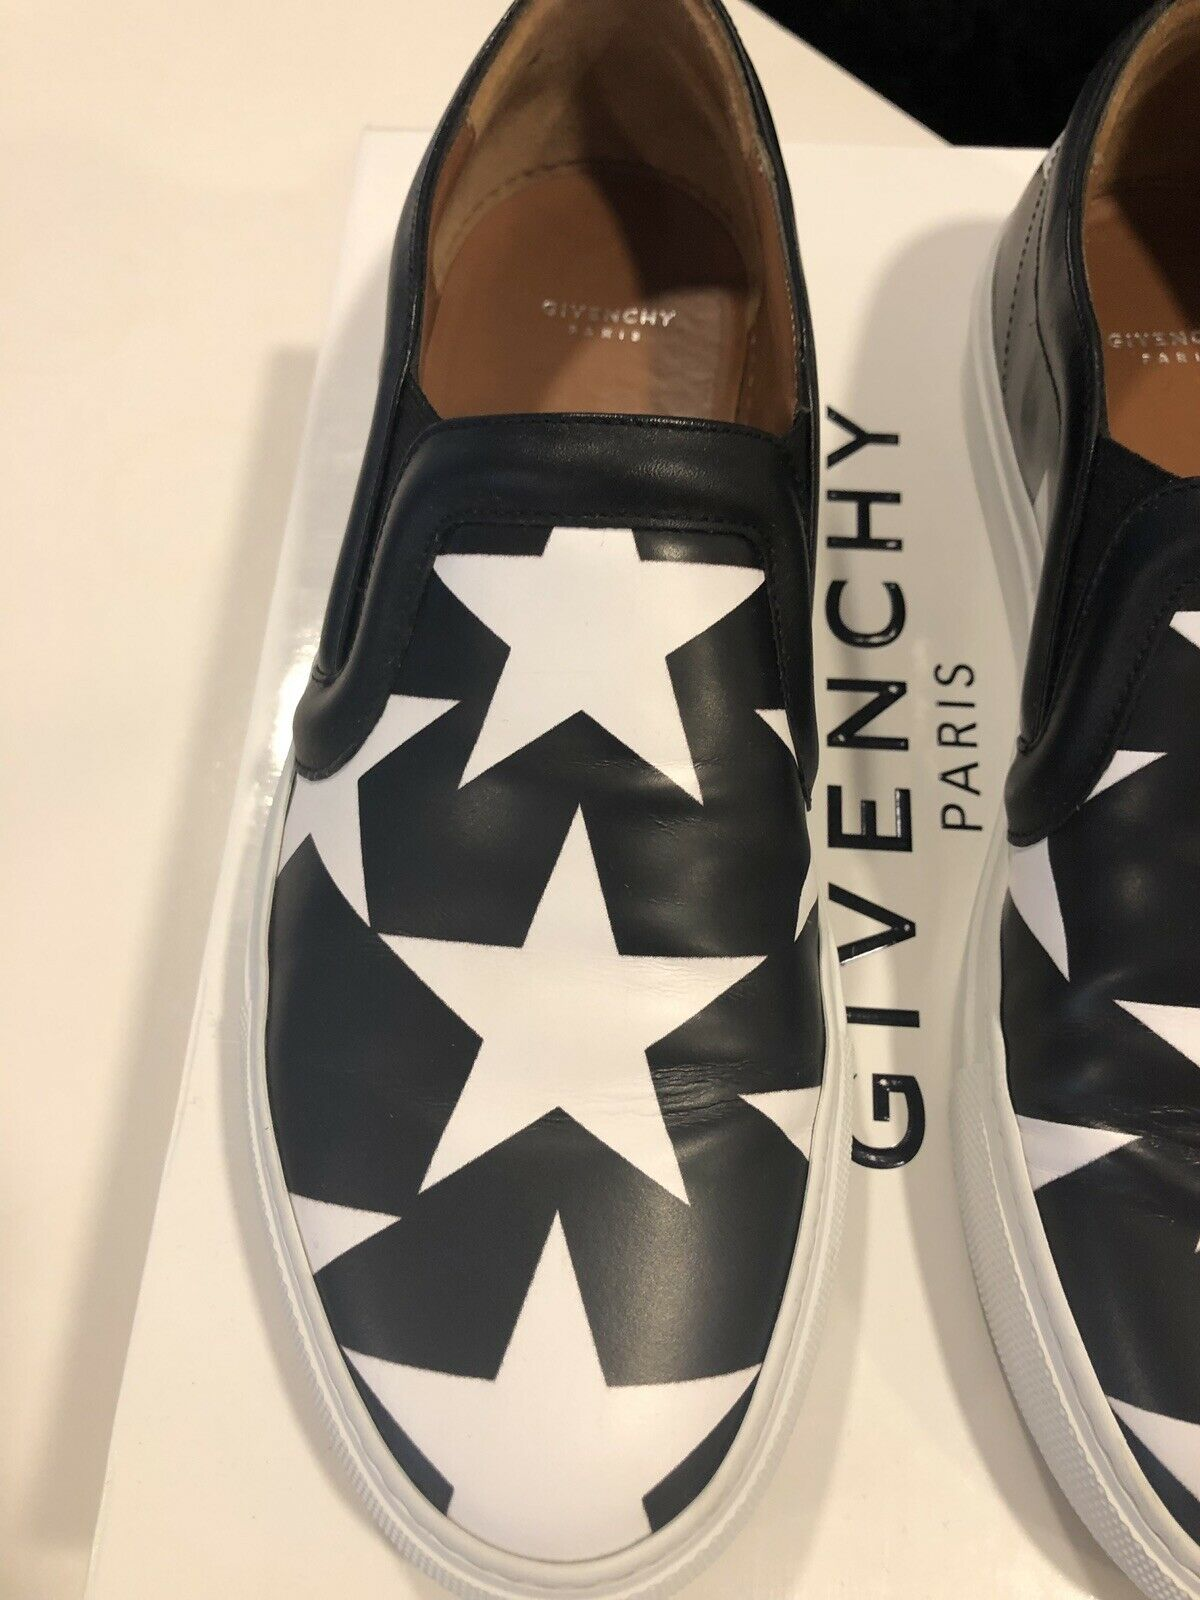 Givenchy Damen Slip On Stars Turnschuhe EU 39,5